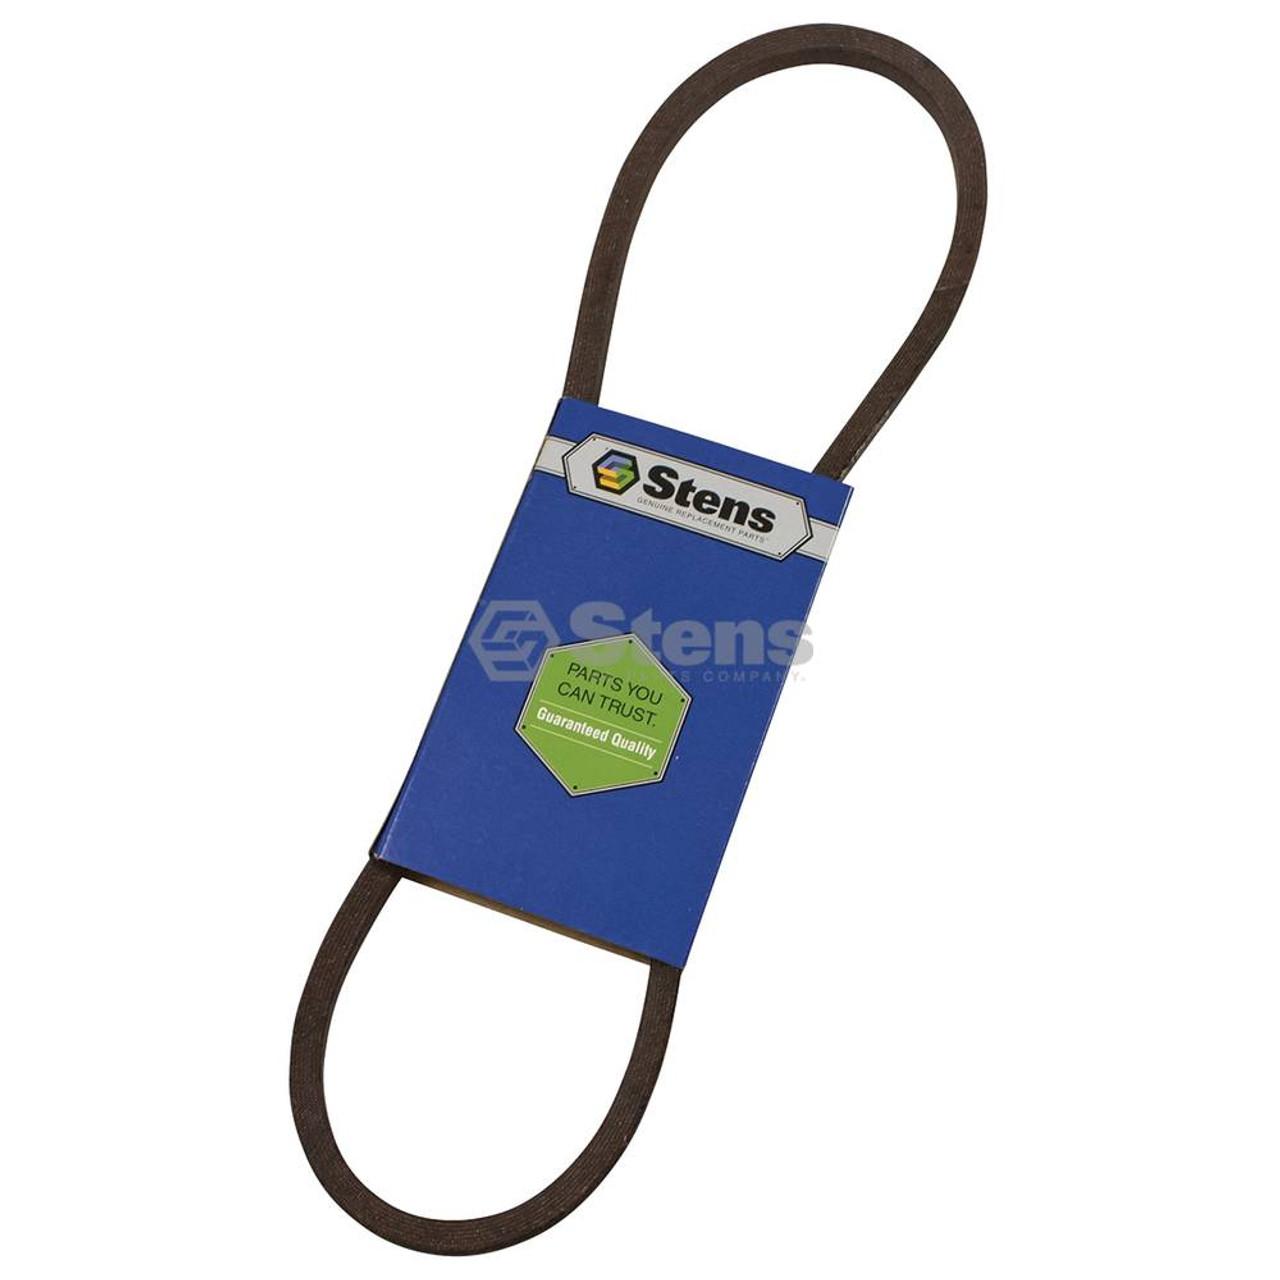 Drive Belt for Husqvarna 1827EXLT, 1830EXLT, ST327T, ST330T, 532428454 Snowblower, snowthrower, snow blower thrower